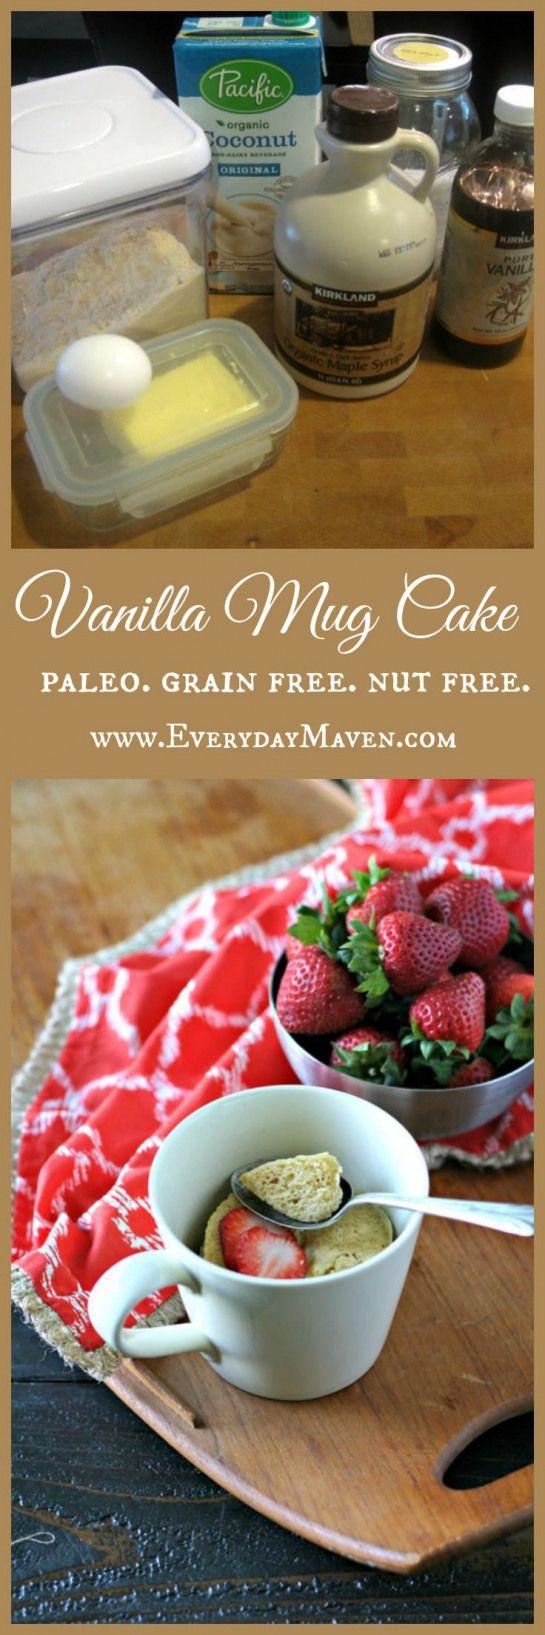 Your favorite recipe source for healthy food [Paleo, Vegan, Gluten free] Paleo Vanilla Mug Cake